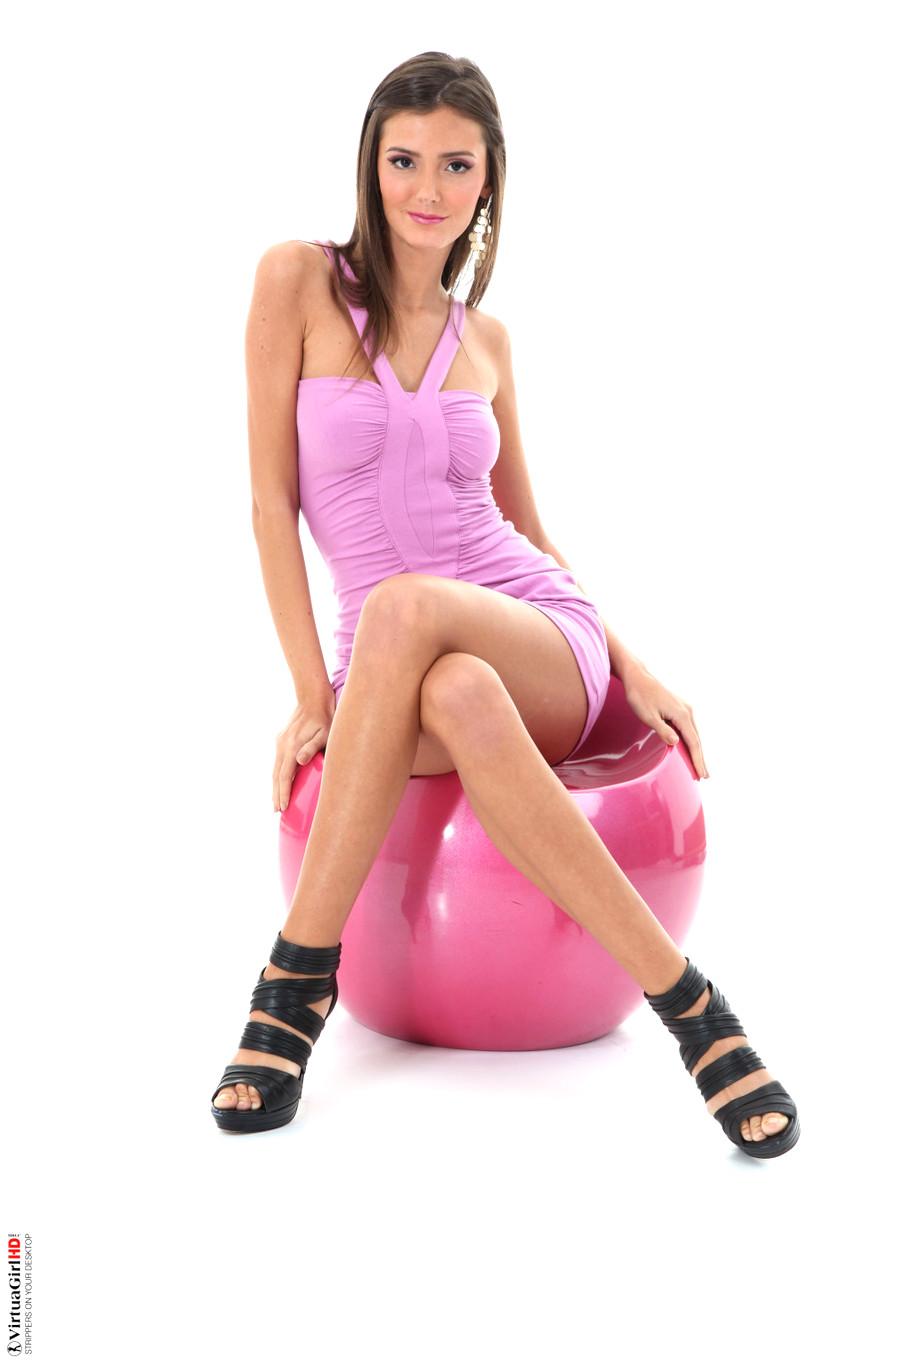 Babe Today Virtua Girl Hd Robin Sexual Free Virtua Girls